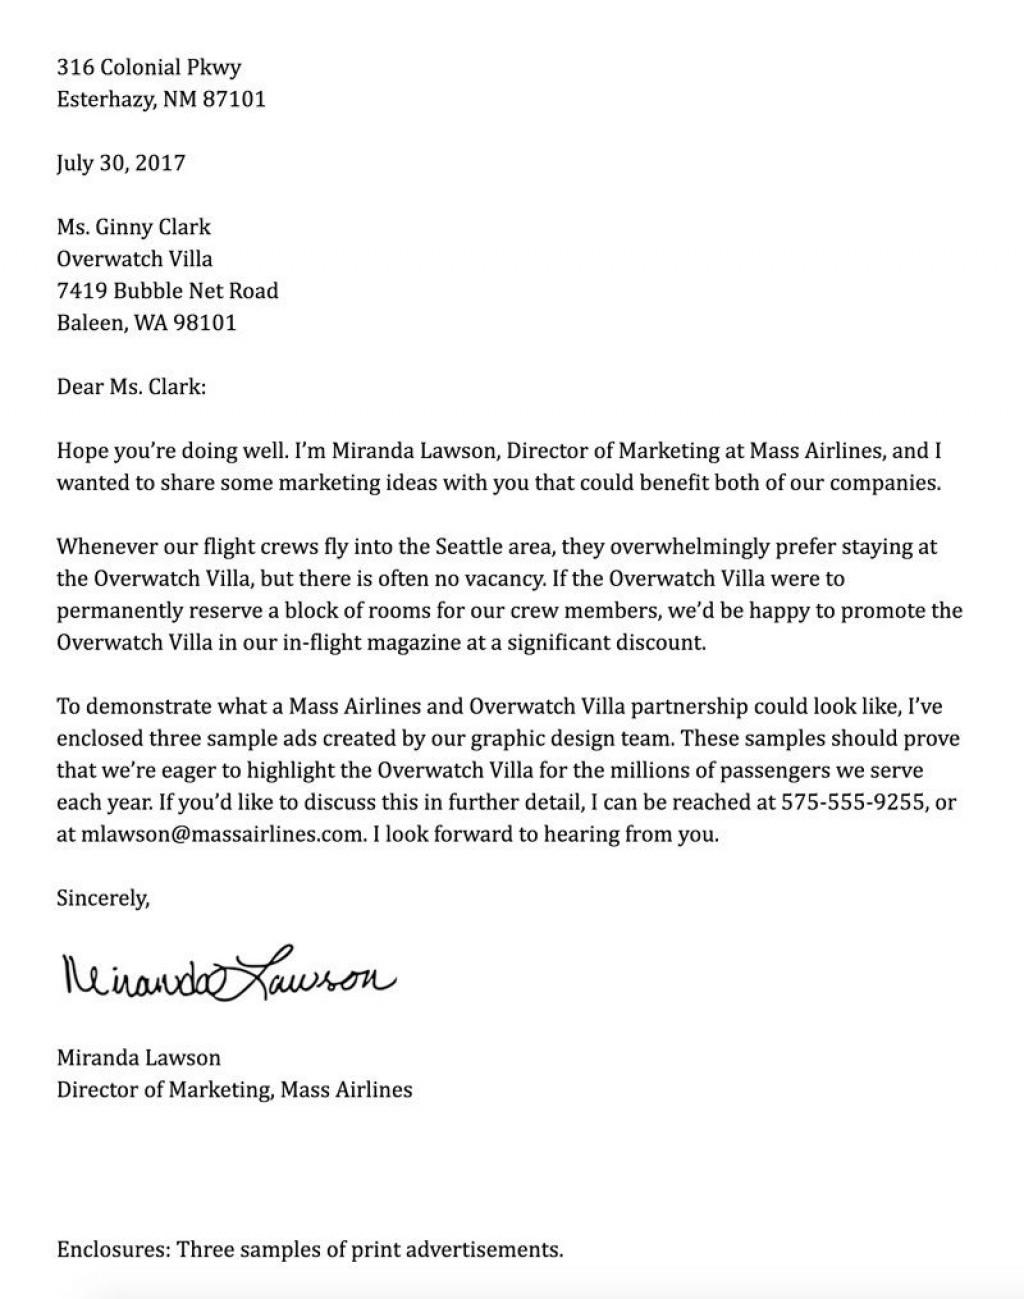 004 Marvelou Formal Busines Letter Template Photo  Pdf Australia FormatLarge